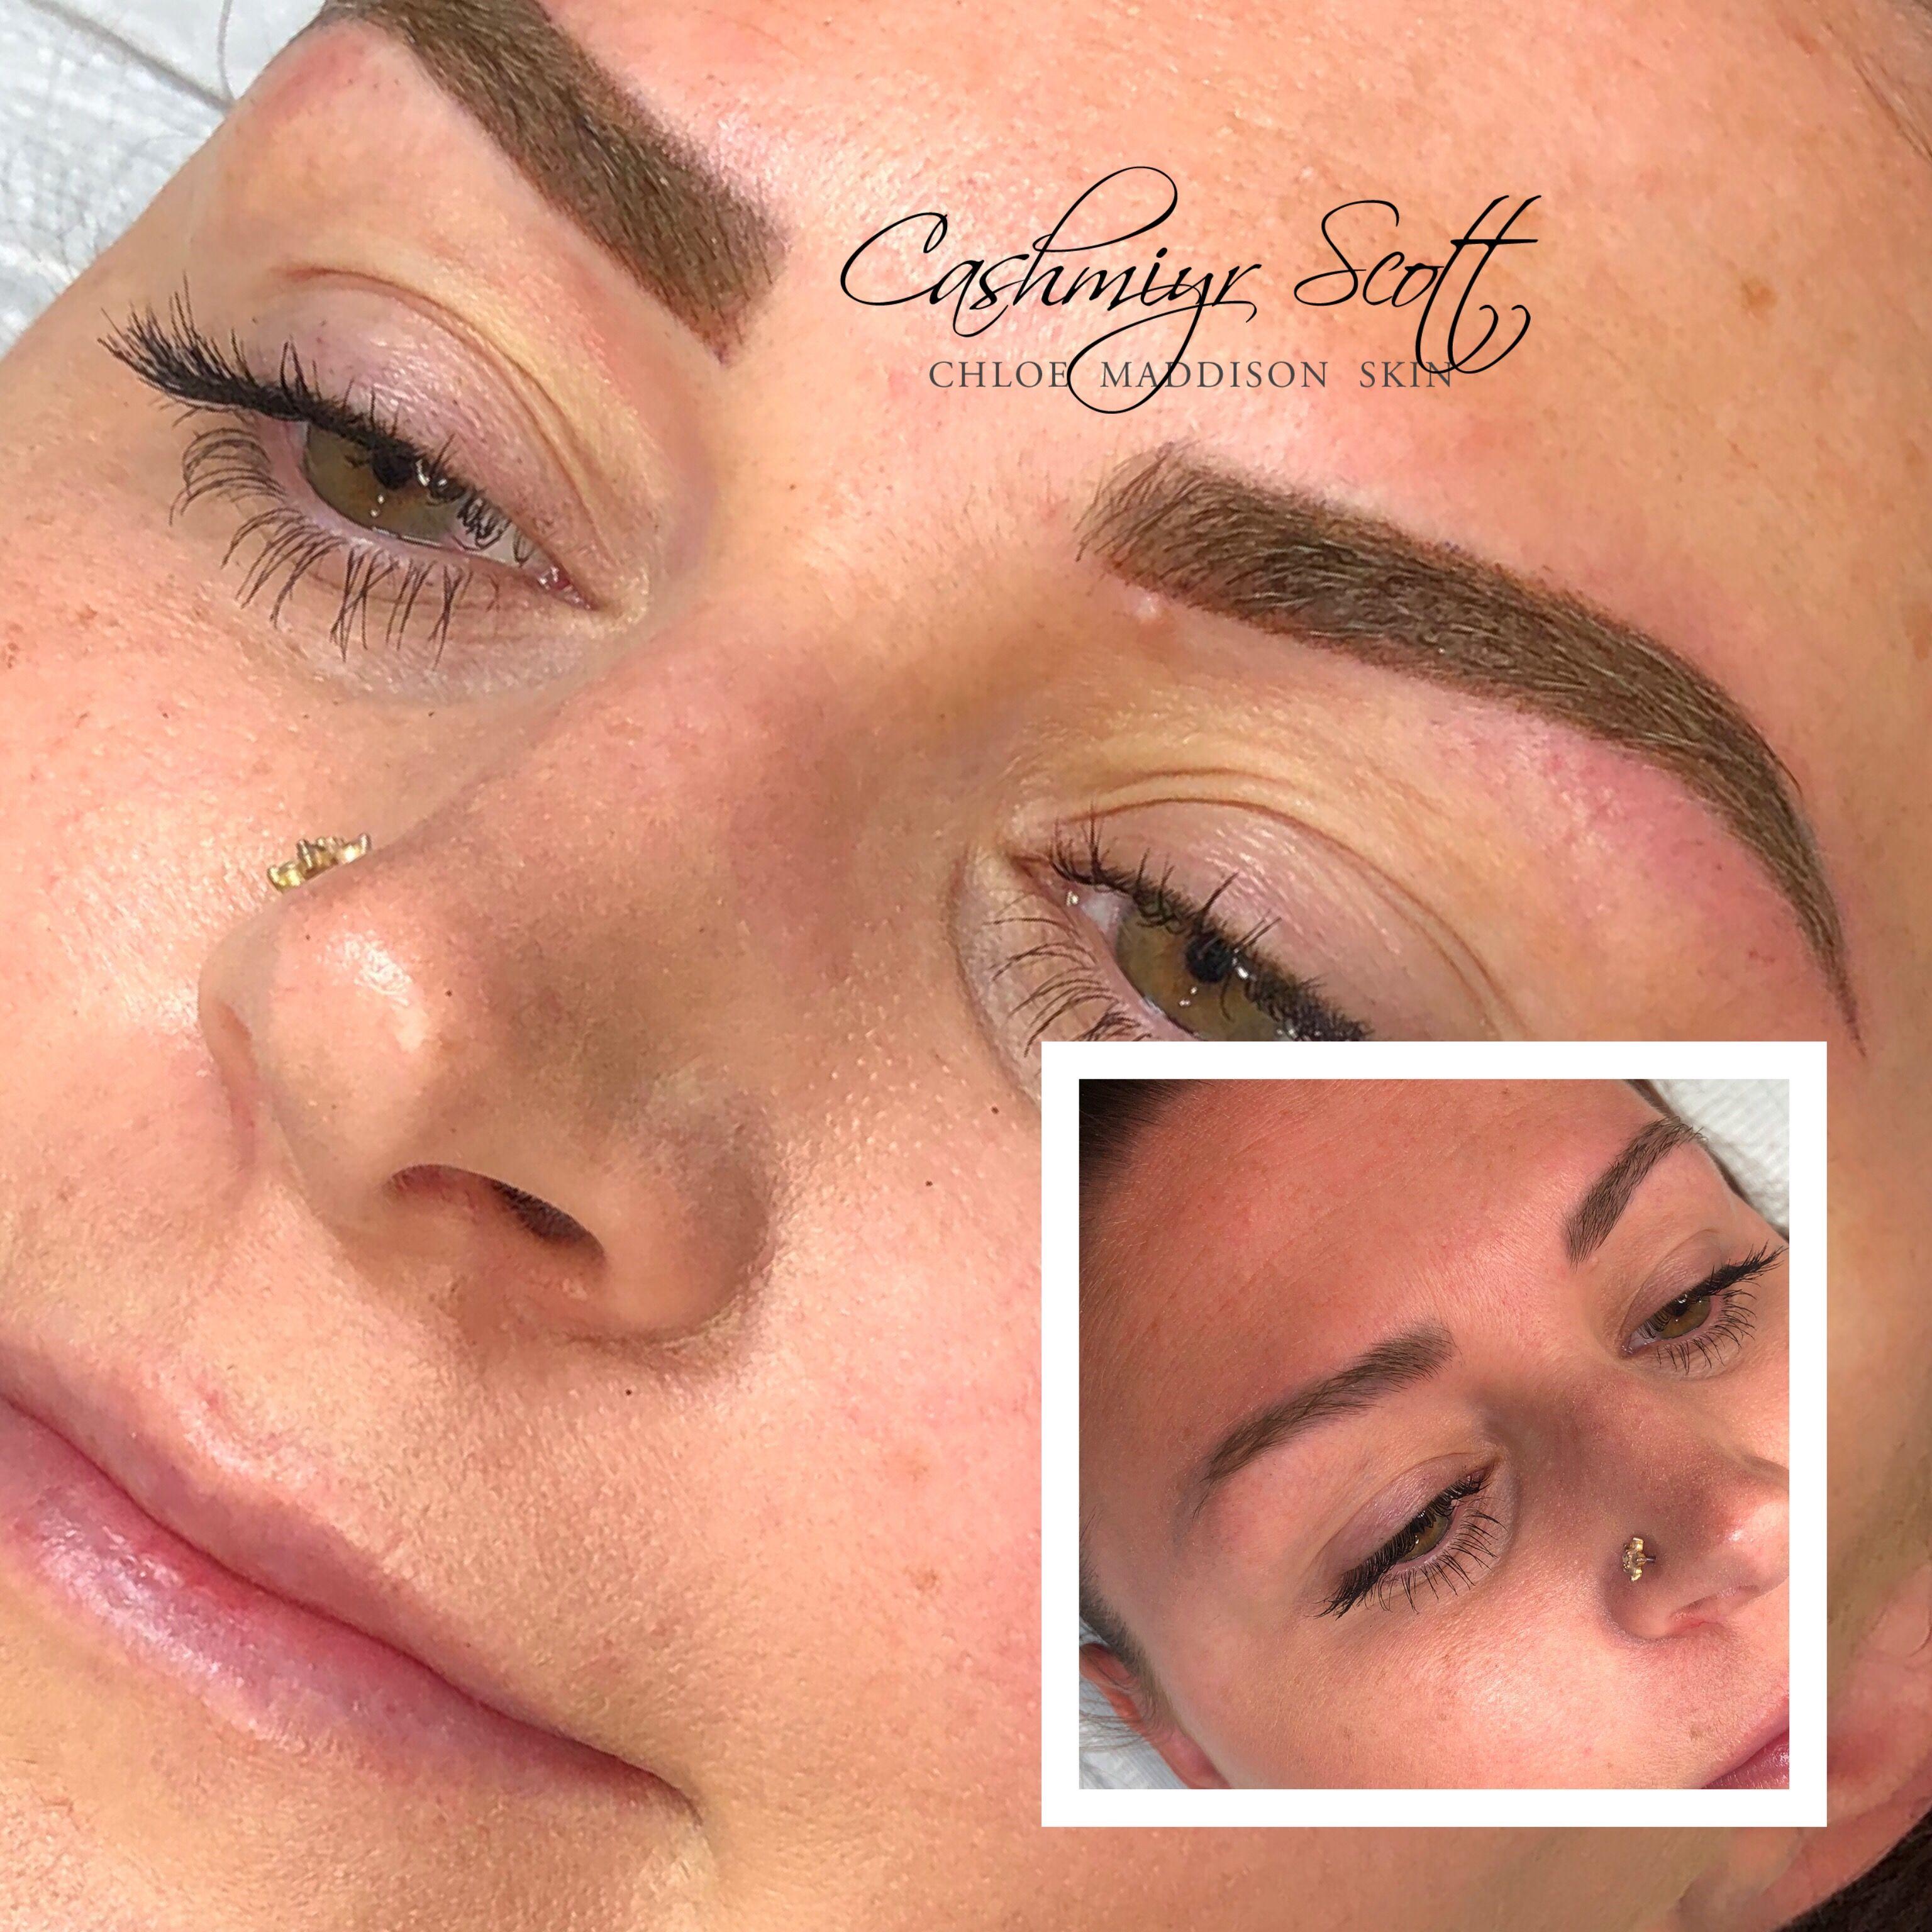 Microblading Cover Up Permanent makeup, Microblading, Makeup